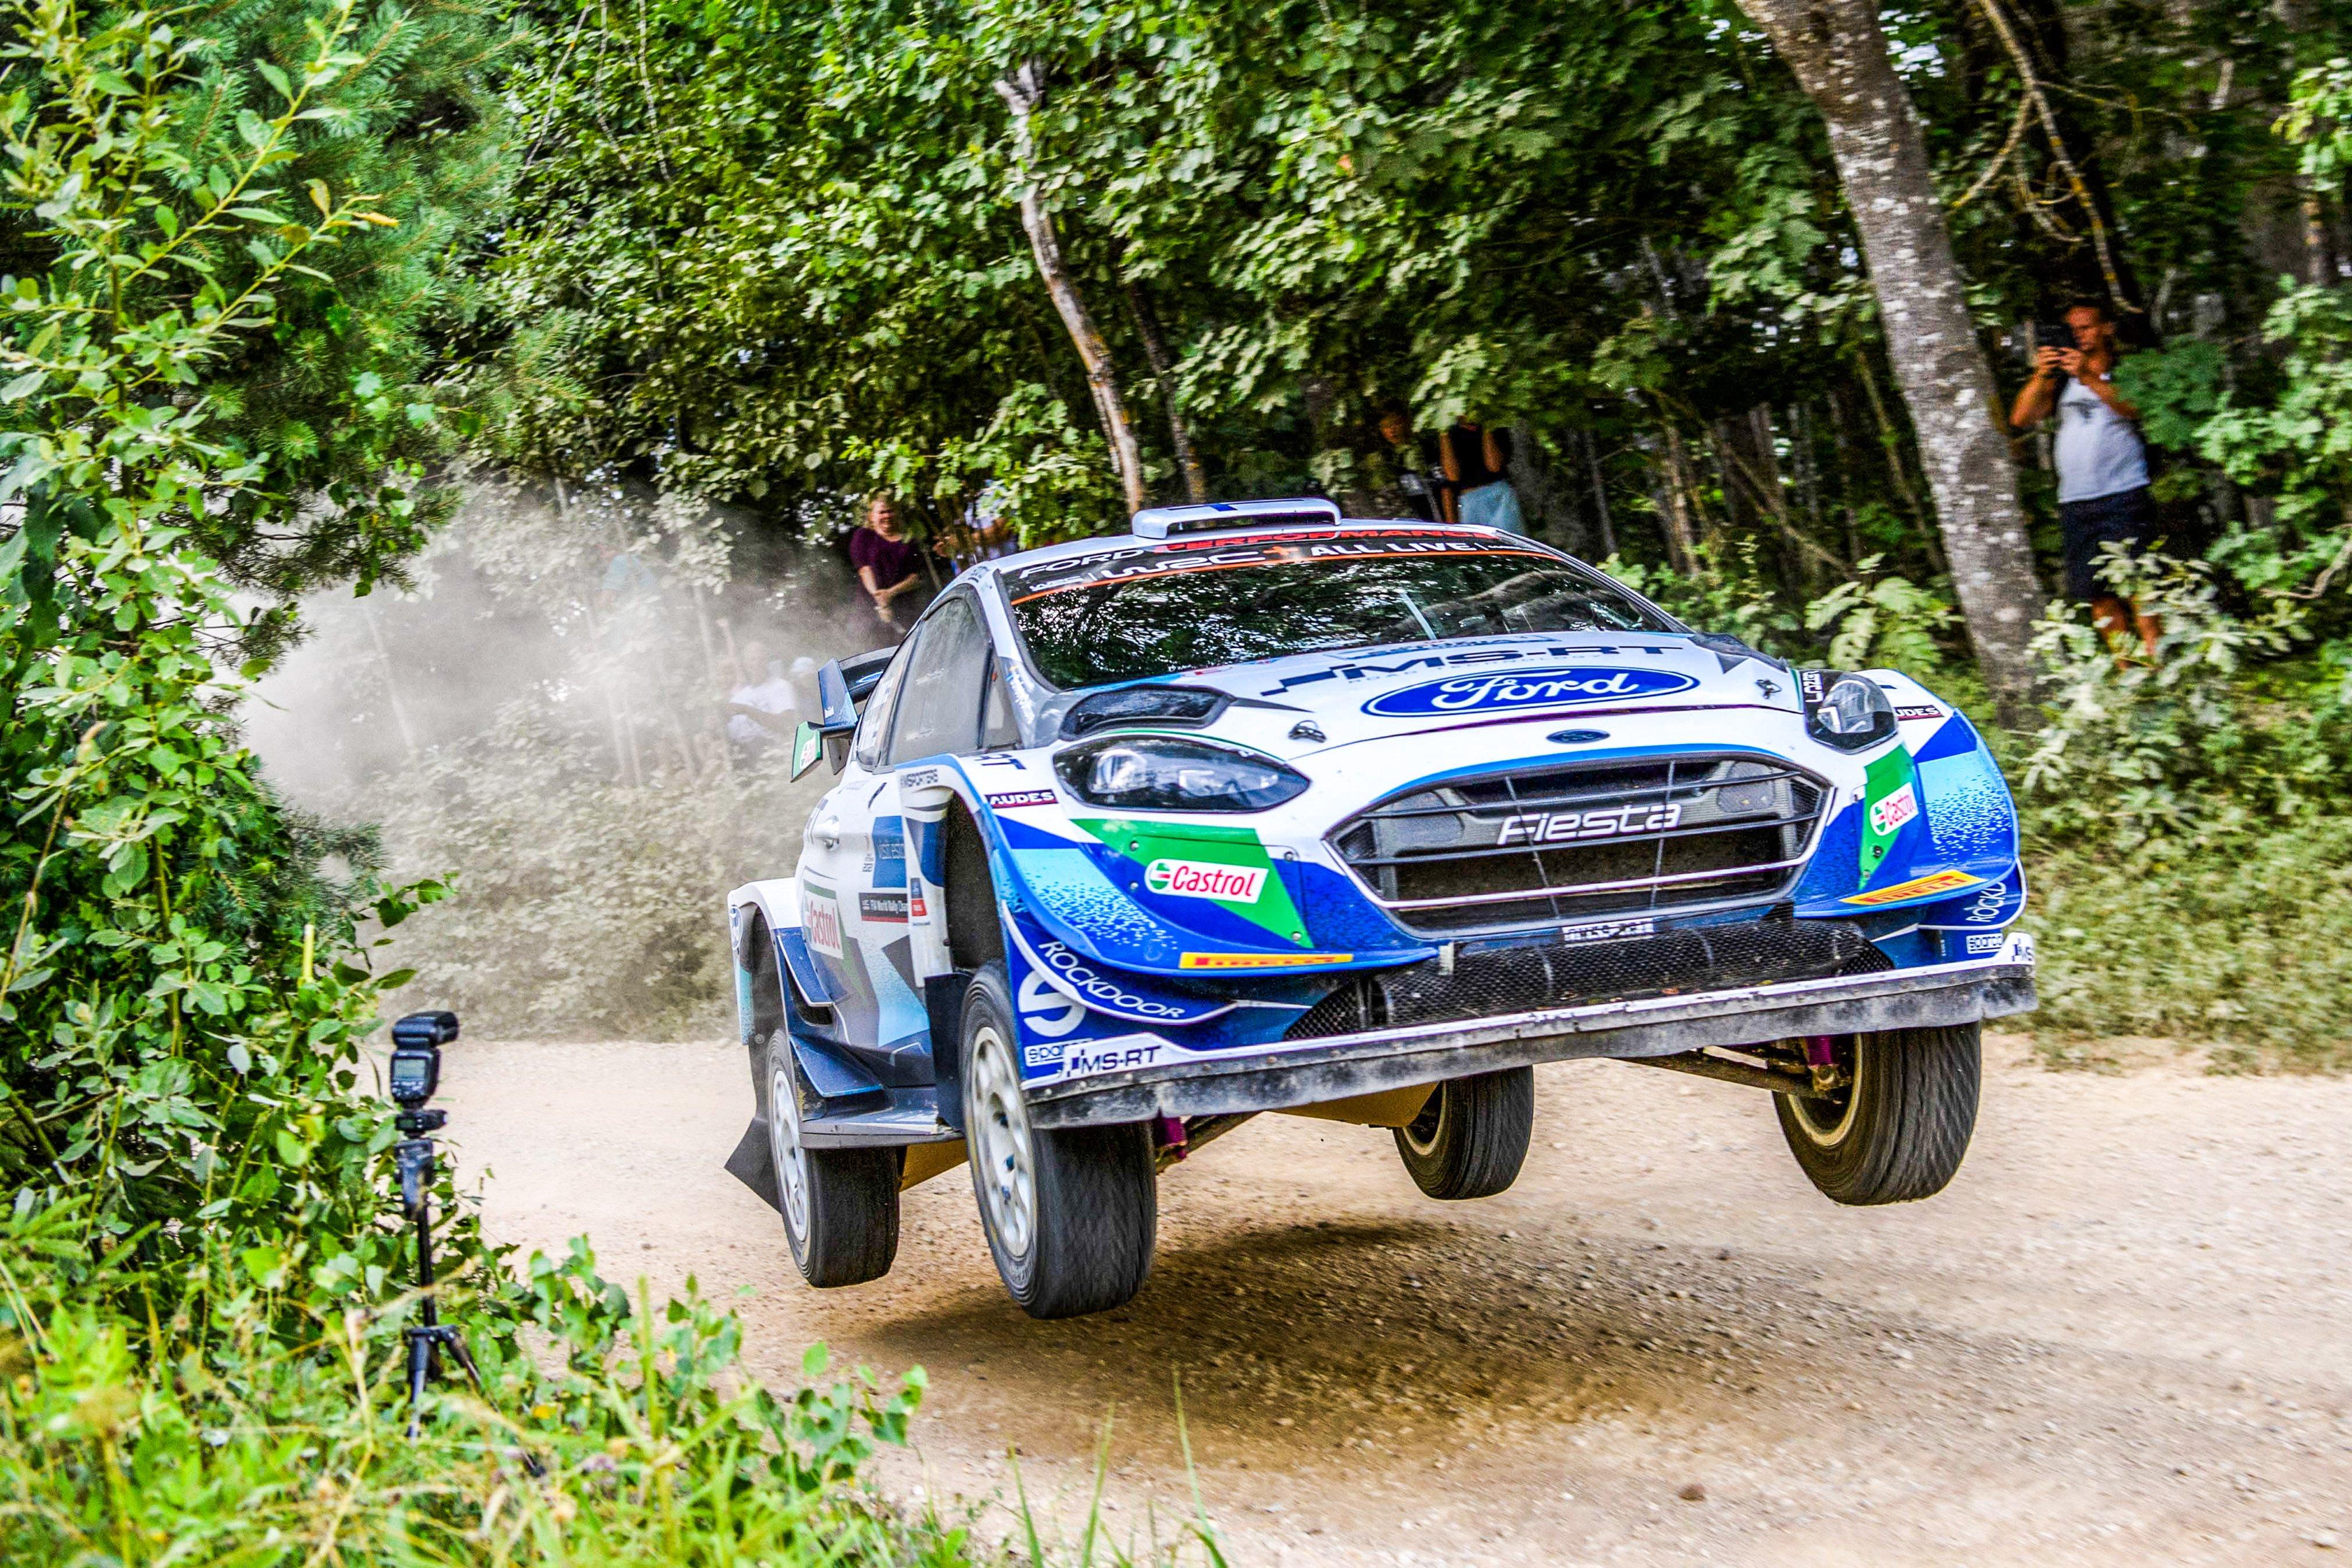 WRC: 11º Rally Estonia [15-18 Julio] - Página 3 E6jccSZWQAEdqwF?format=jpg&name=4096x4096